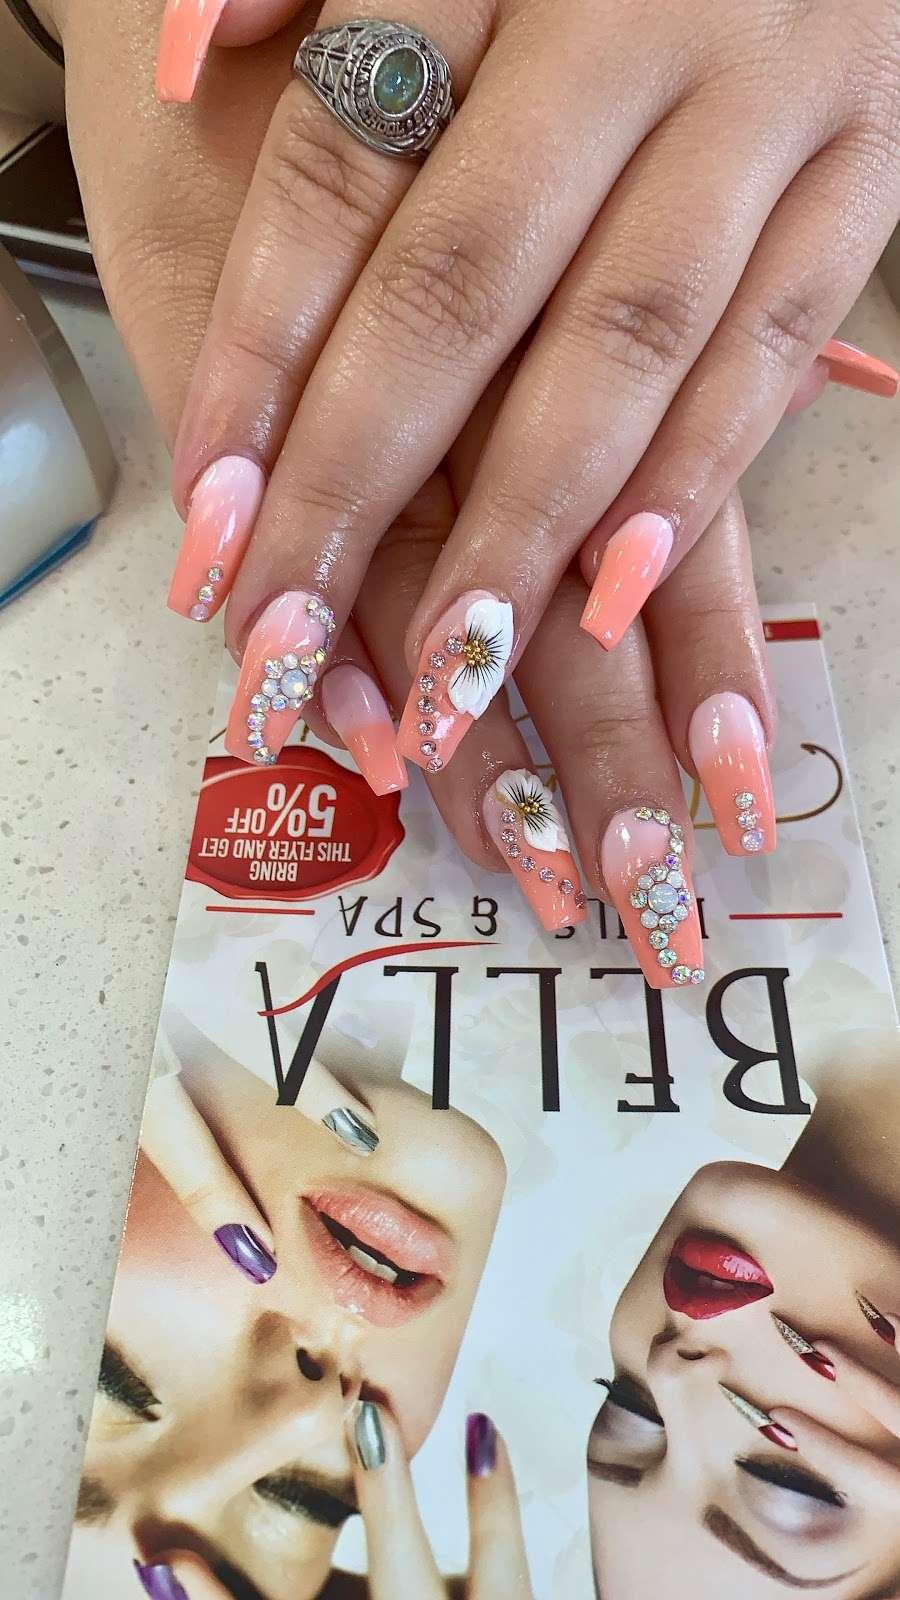 Bella Nails & Spa - shopping mall  | Photo 6 of 10 | Address: 110 Market St, Saddle Brook, NJ 07663, USA | Phone: (201) 909-8599